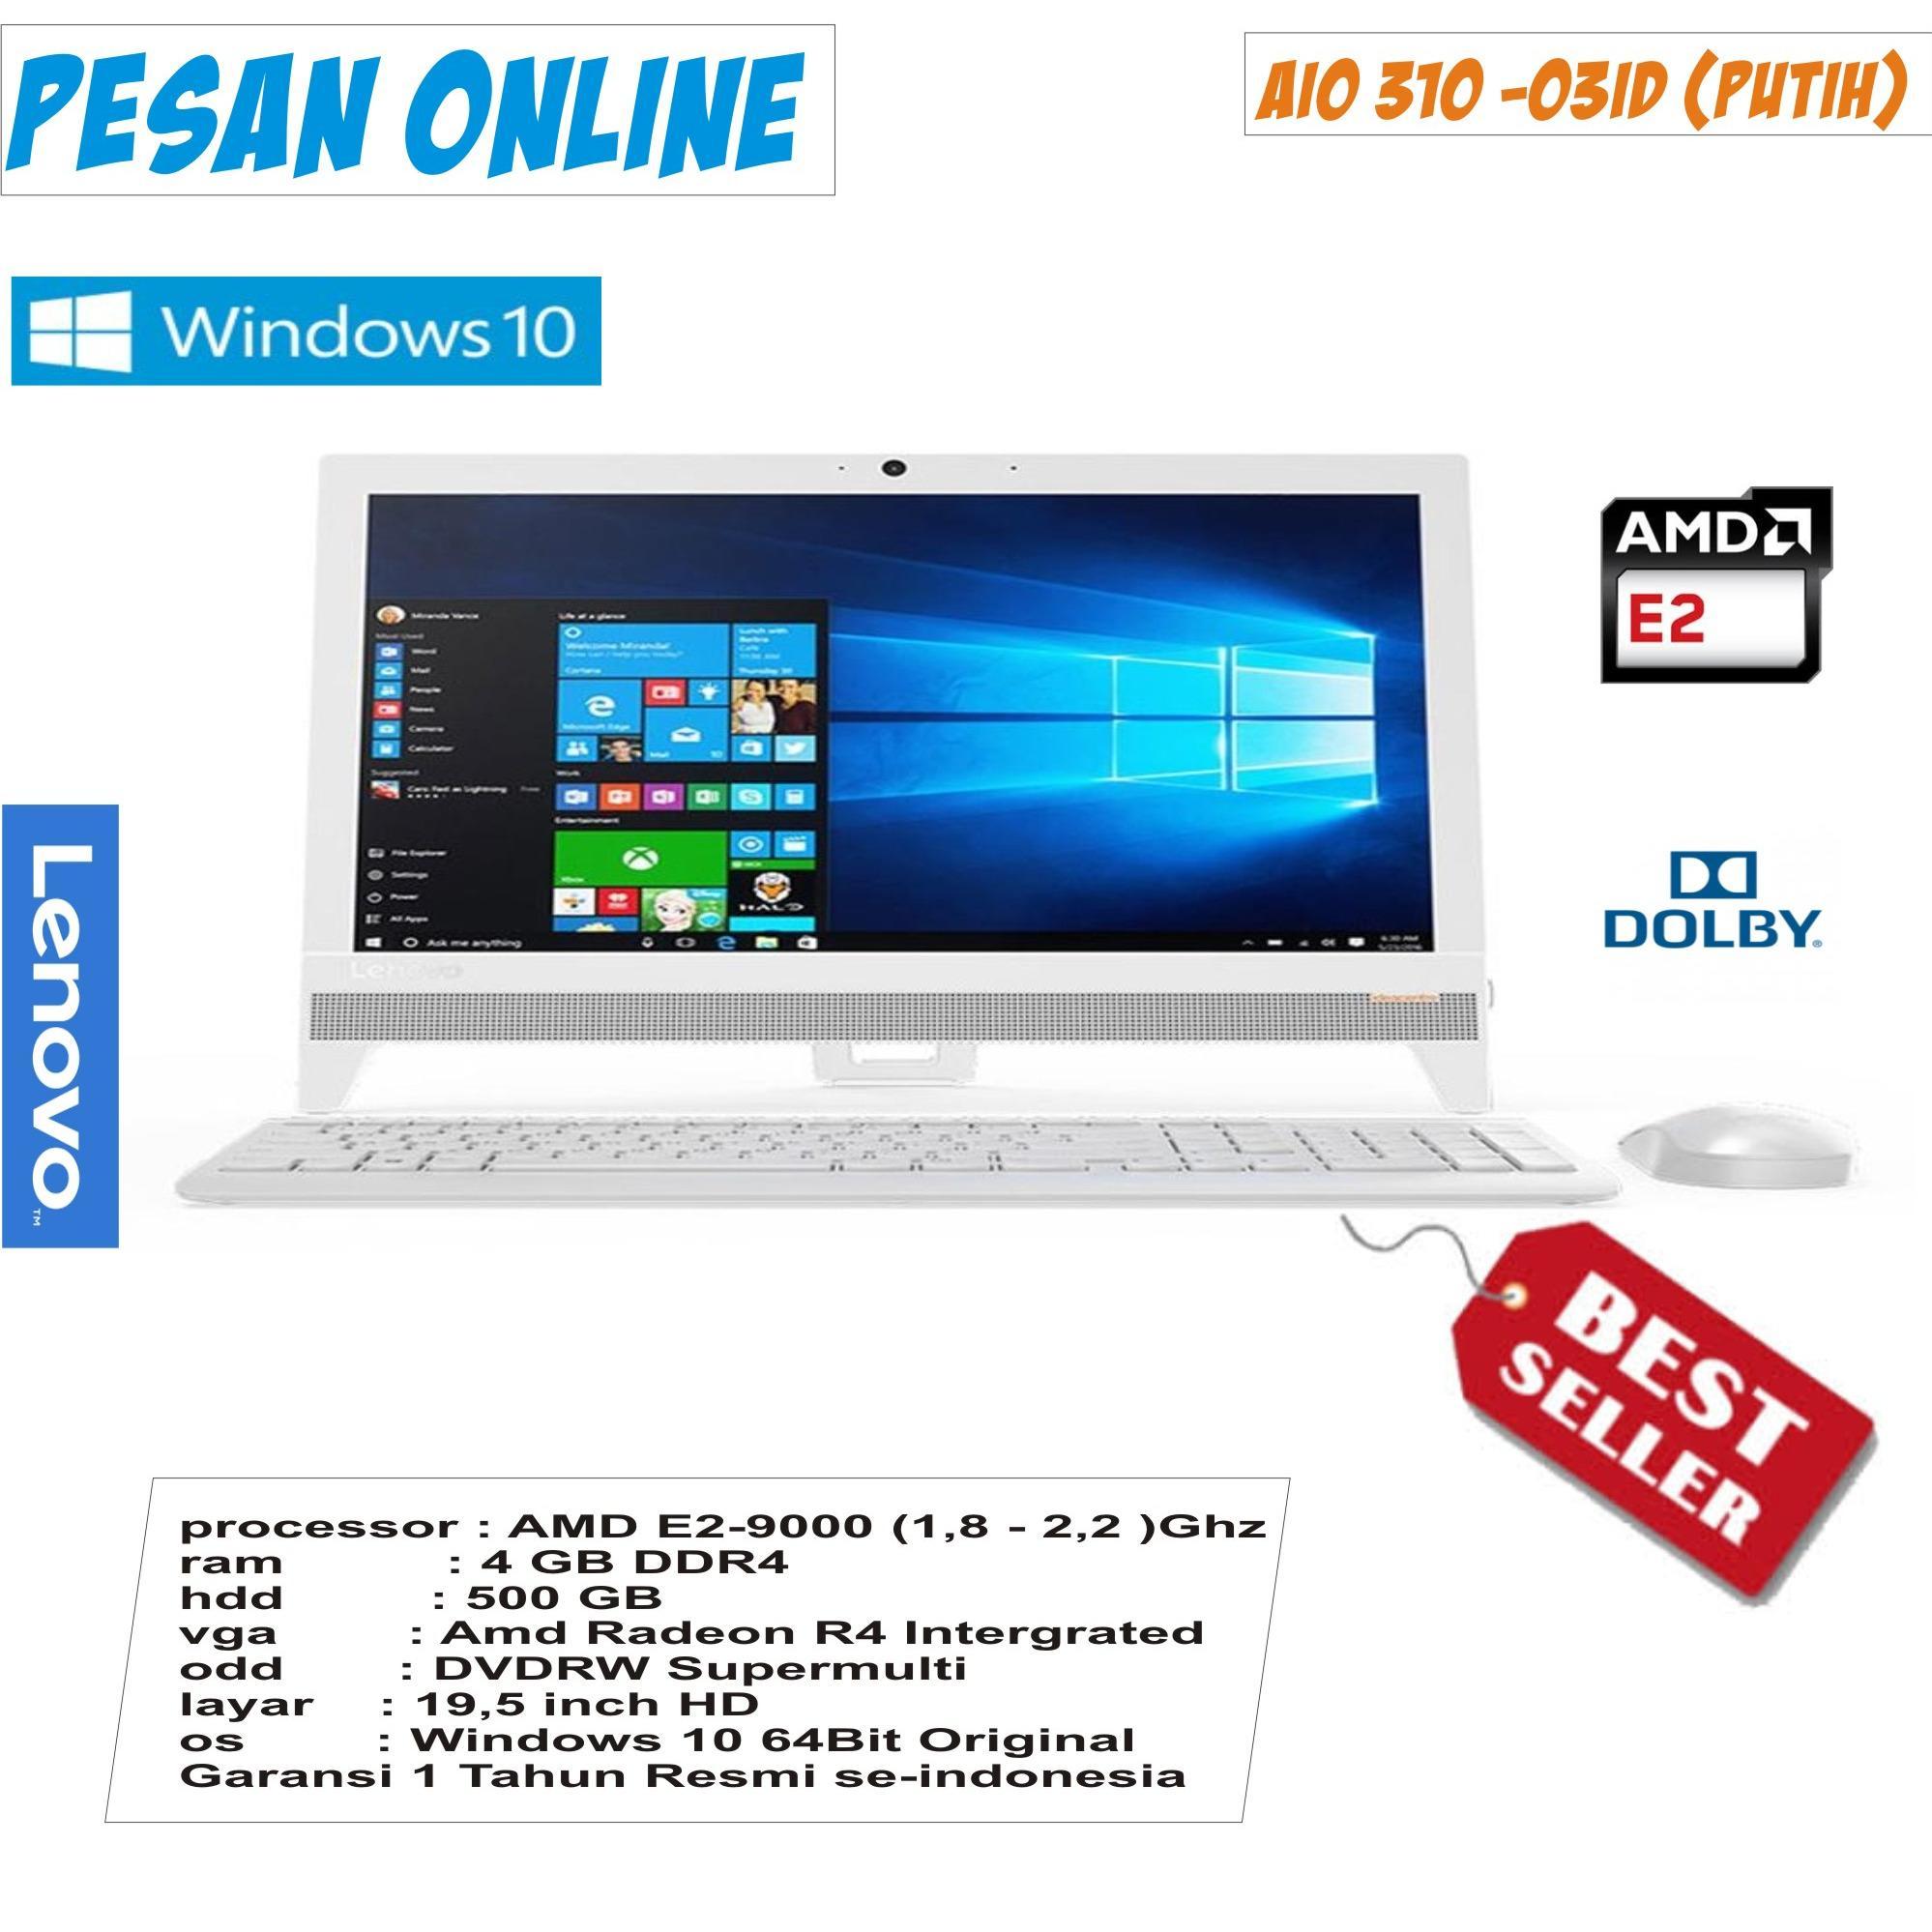 PC all In one 310 - 03ID/AMD E2-9000 Quad core/4 gb / 500 gb/ 19,5 inch/dvd/radeon R3/windows 10/ garansi resmi berlaku se-indonesia